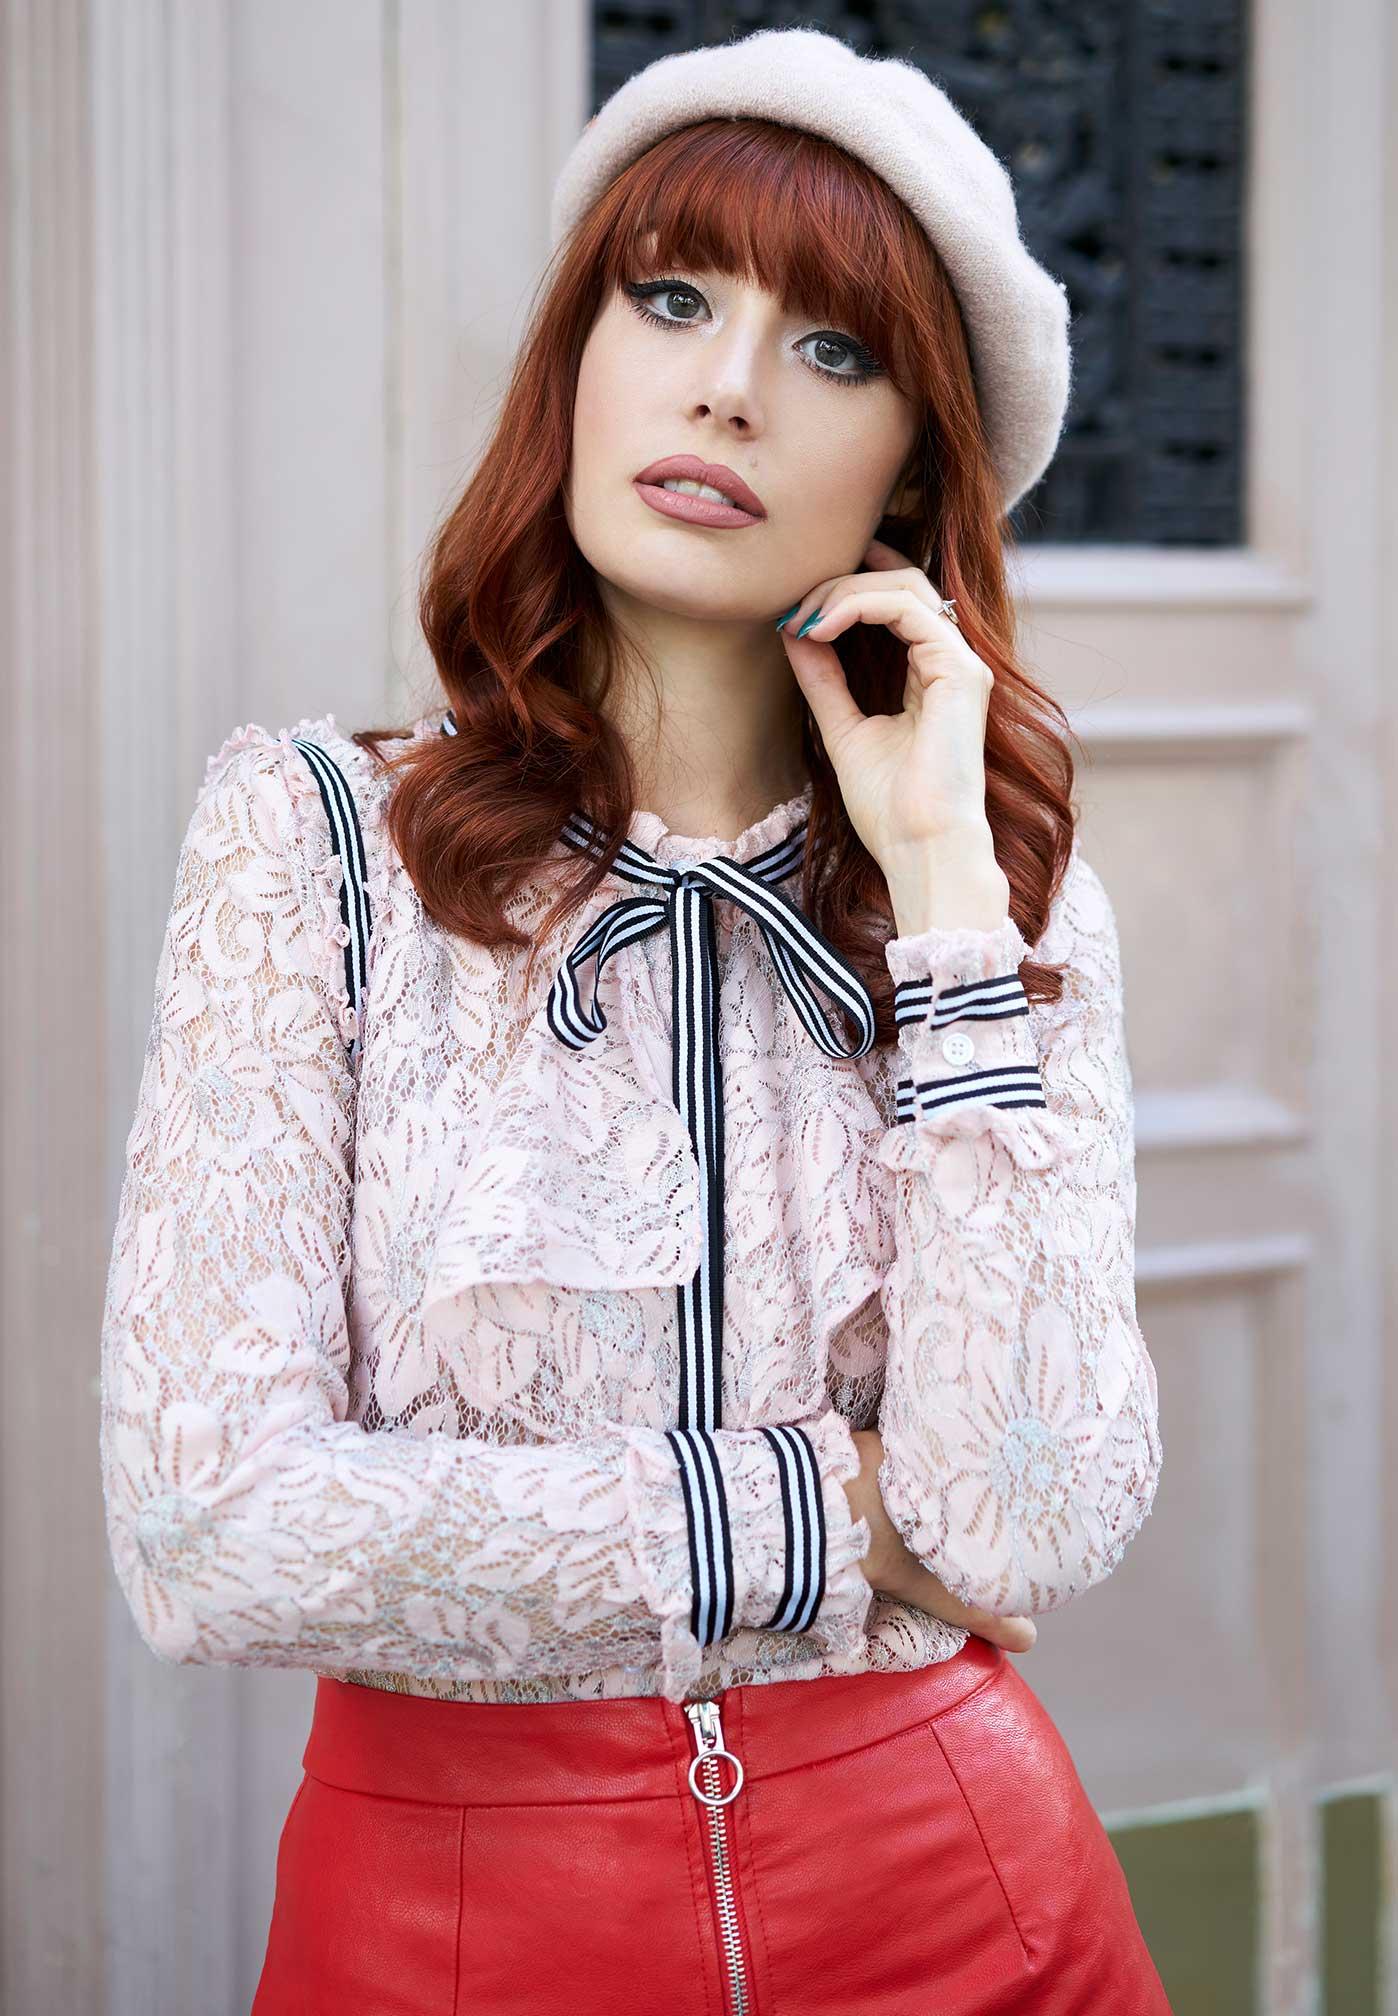 Louise im eleganten Outfit in Paris